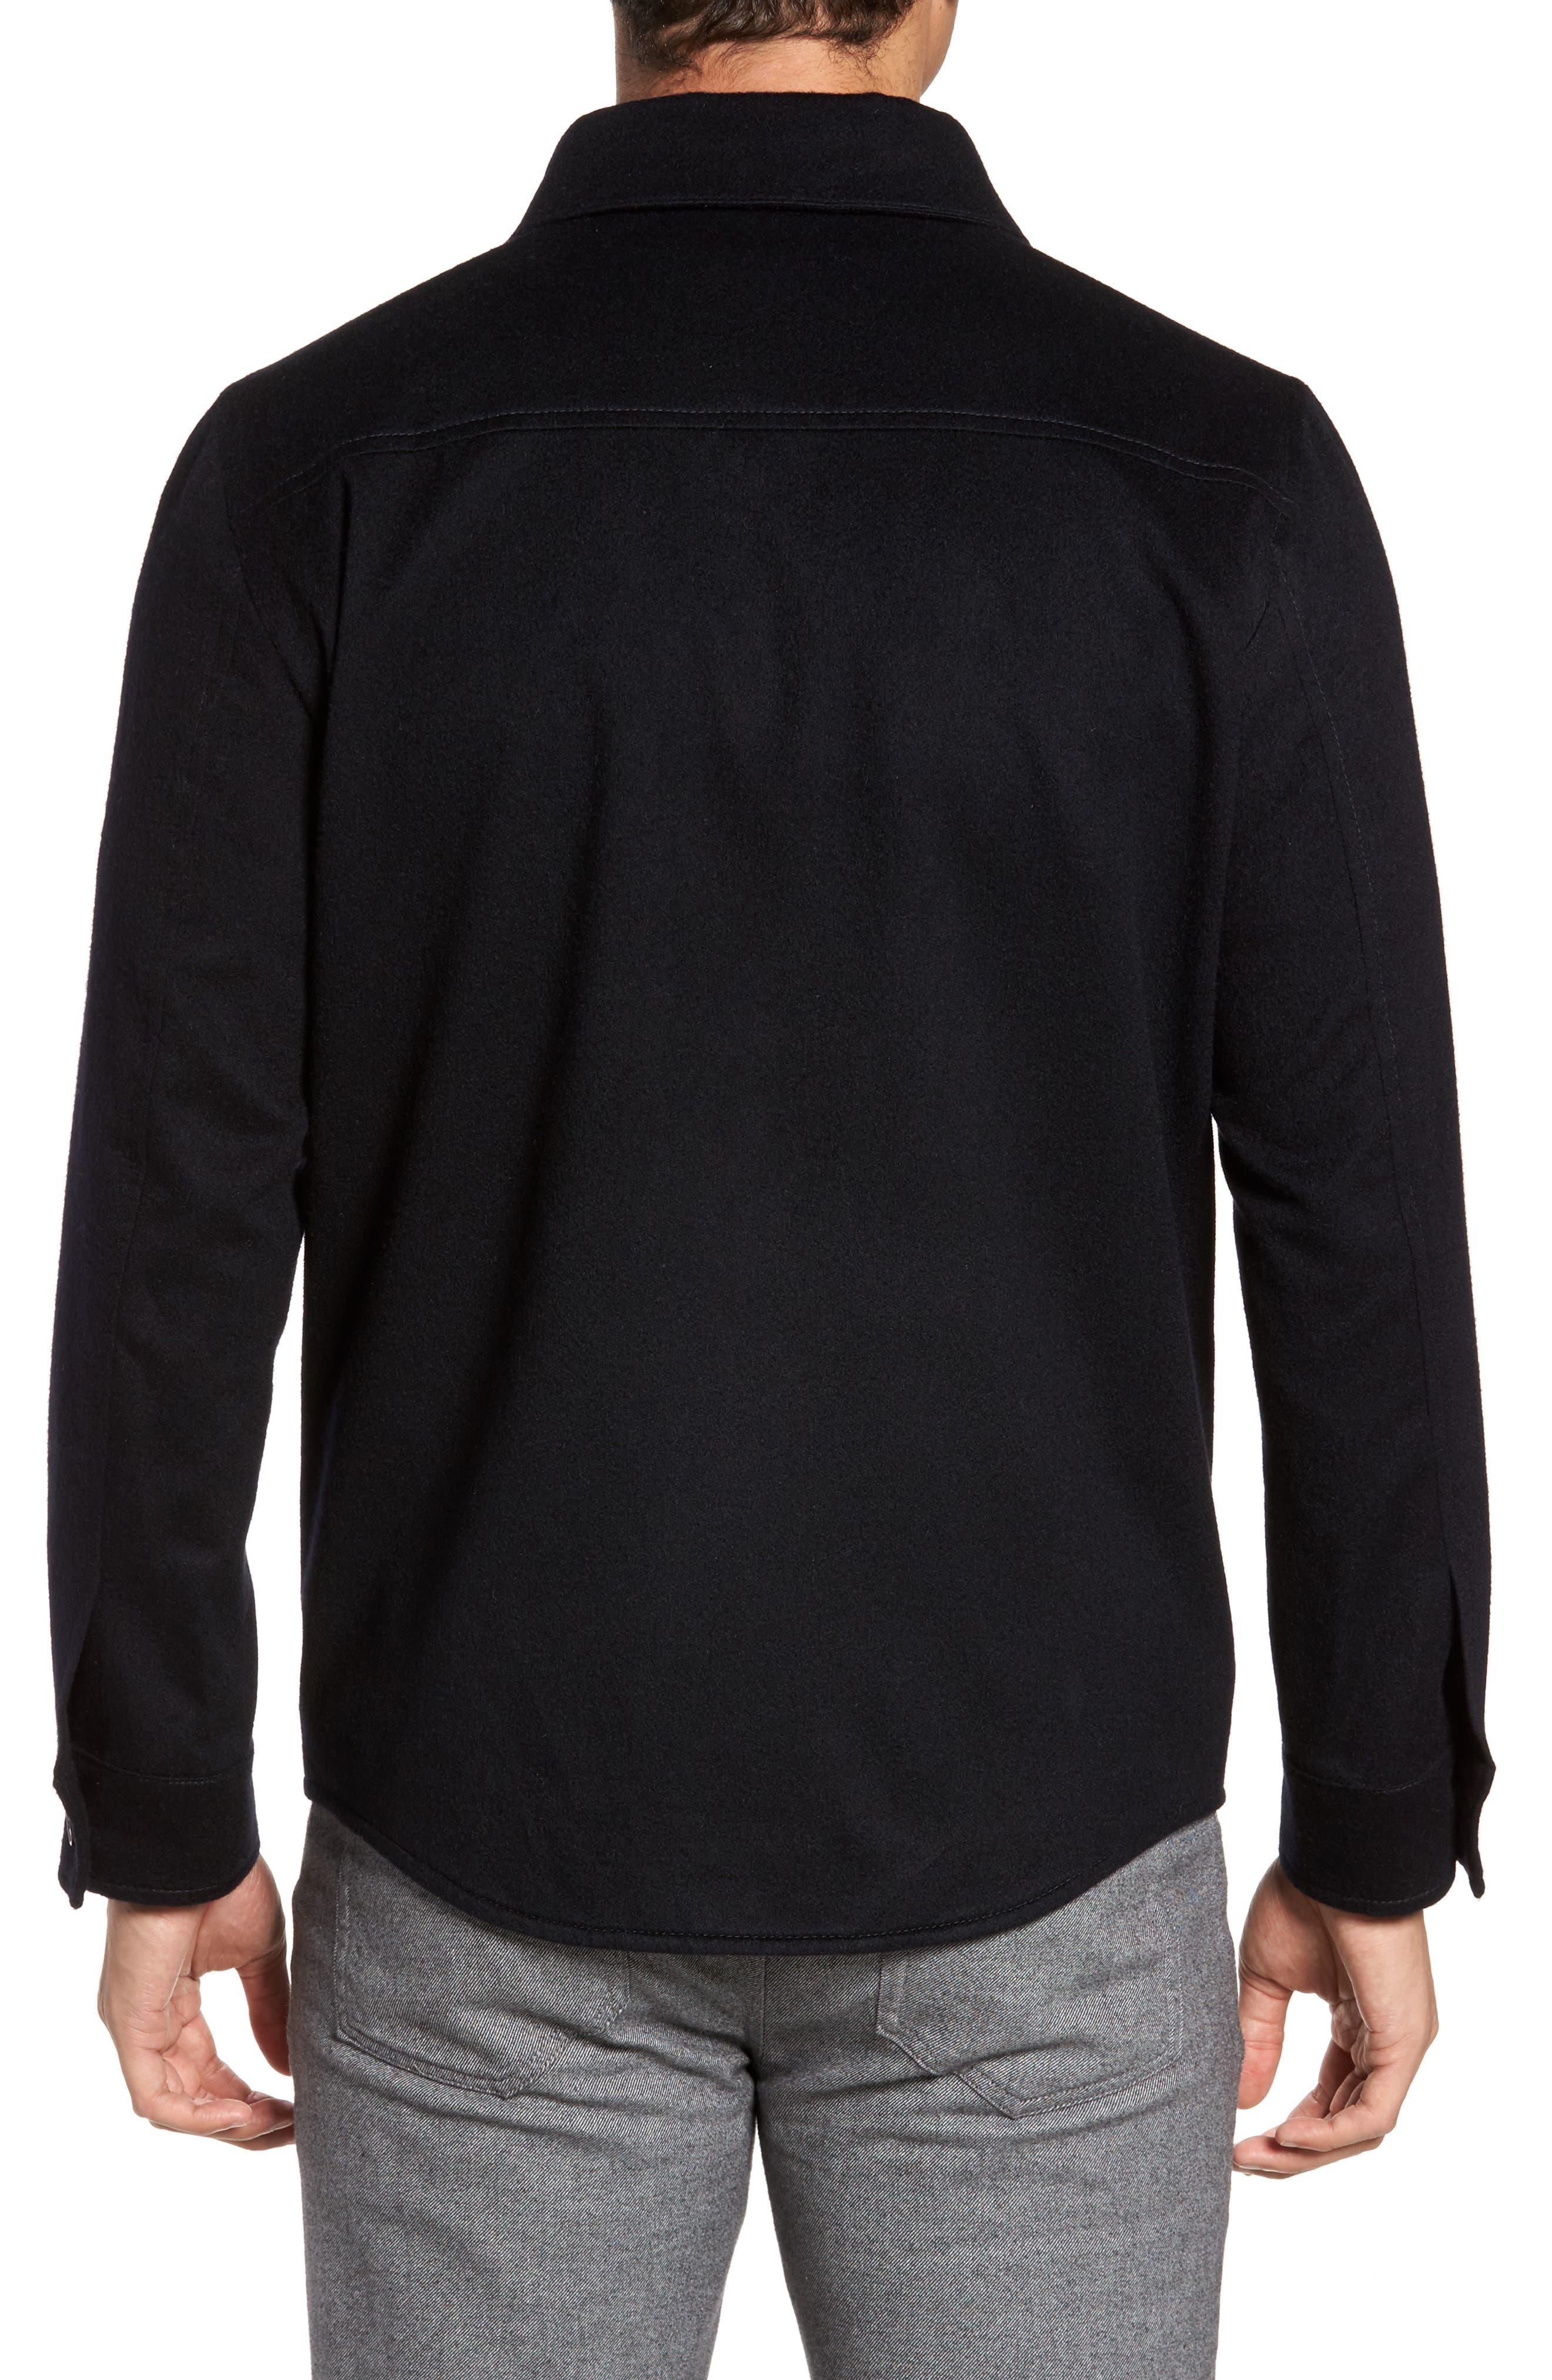 Alternate Image 2  - Peter Millar Collection Featherweight Journeyman Cashmere Shirt Jacket